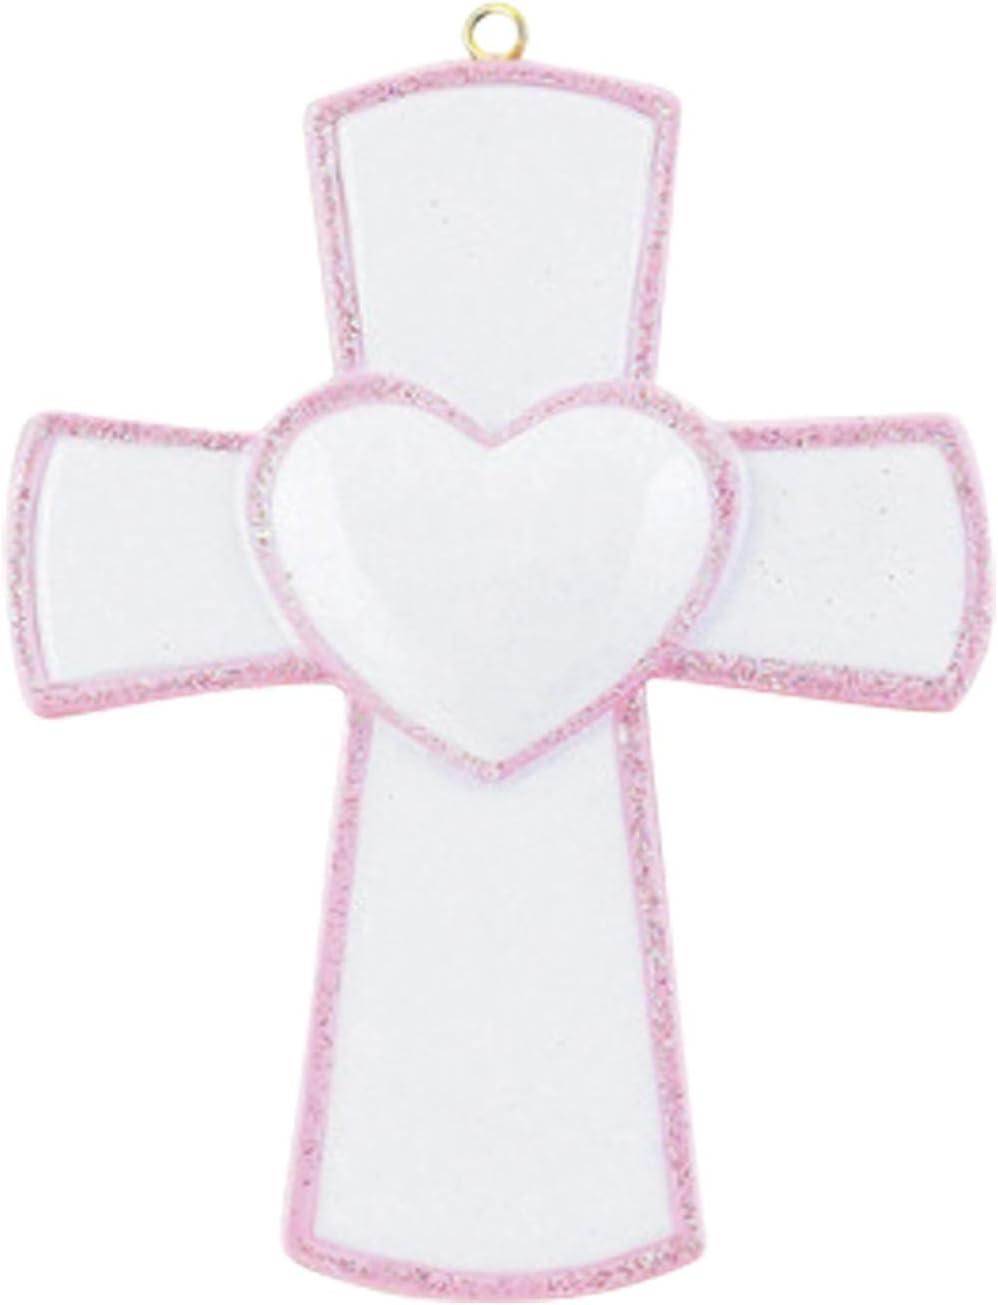 Christmas Christian 2020 Images Amazon.com: Personalized Cross Christmas Tree Ornament 2020